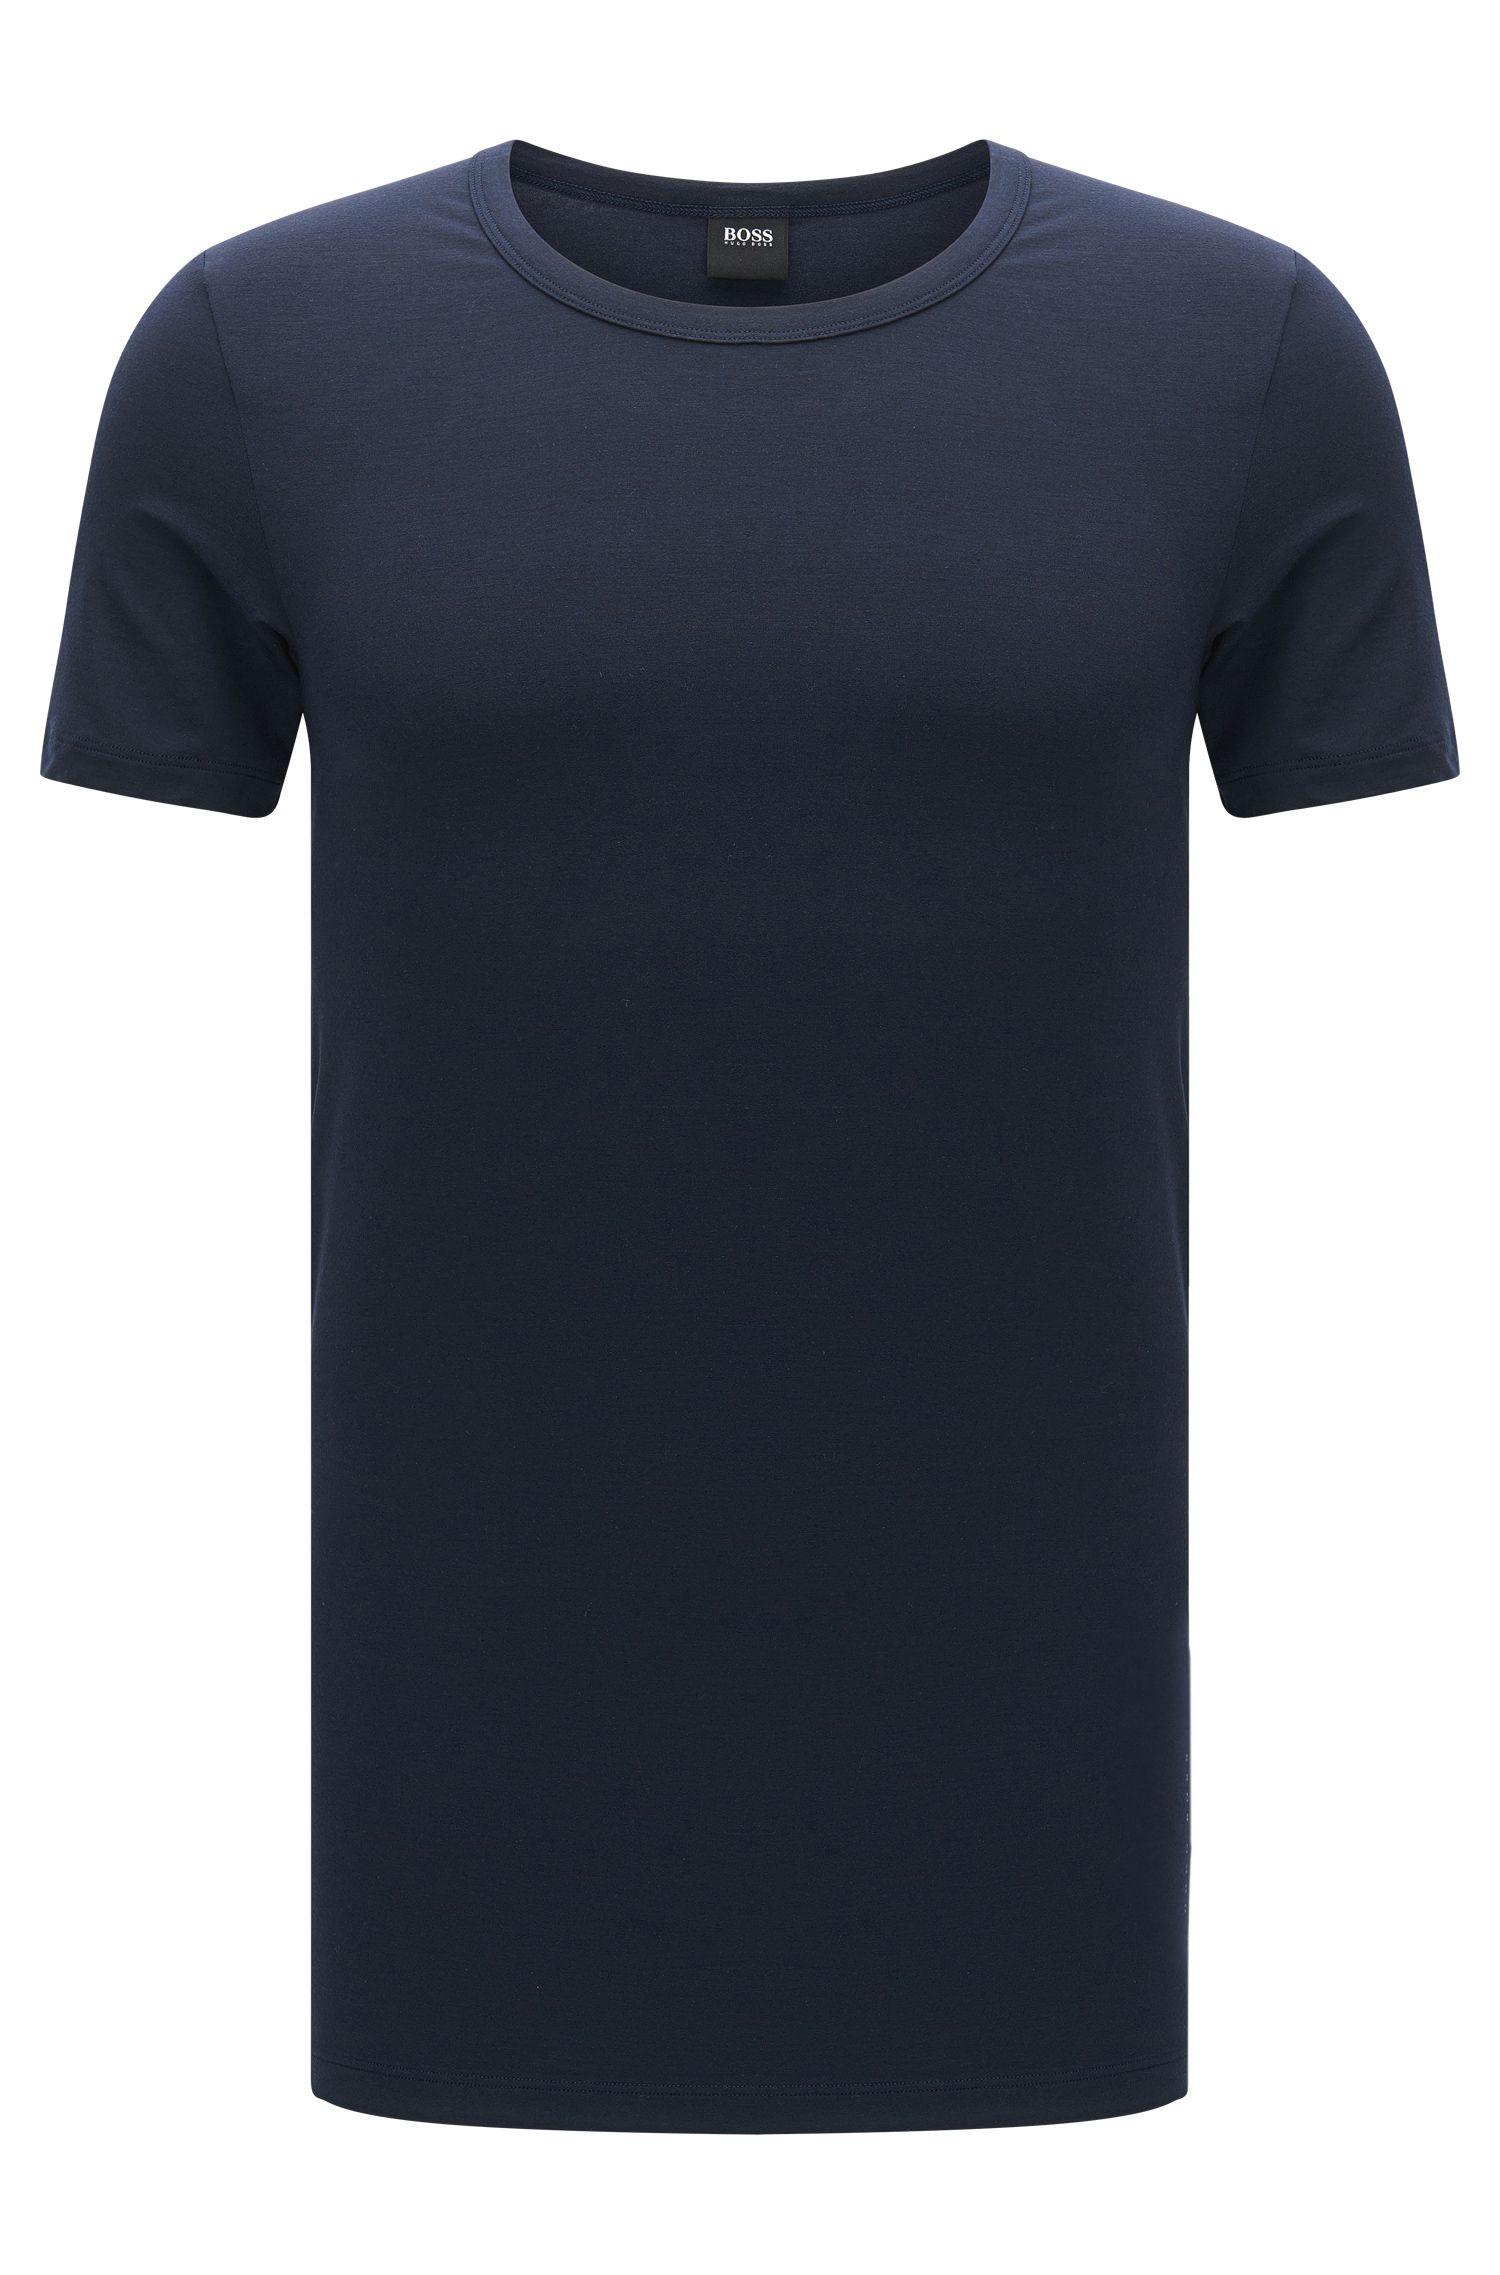 Slim-Fit T-Shirt aus atmungsaktivem Modal-Mix mit Elasthan: 'T-Shirt RN Seacell'